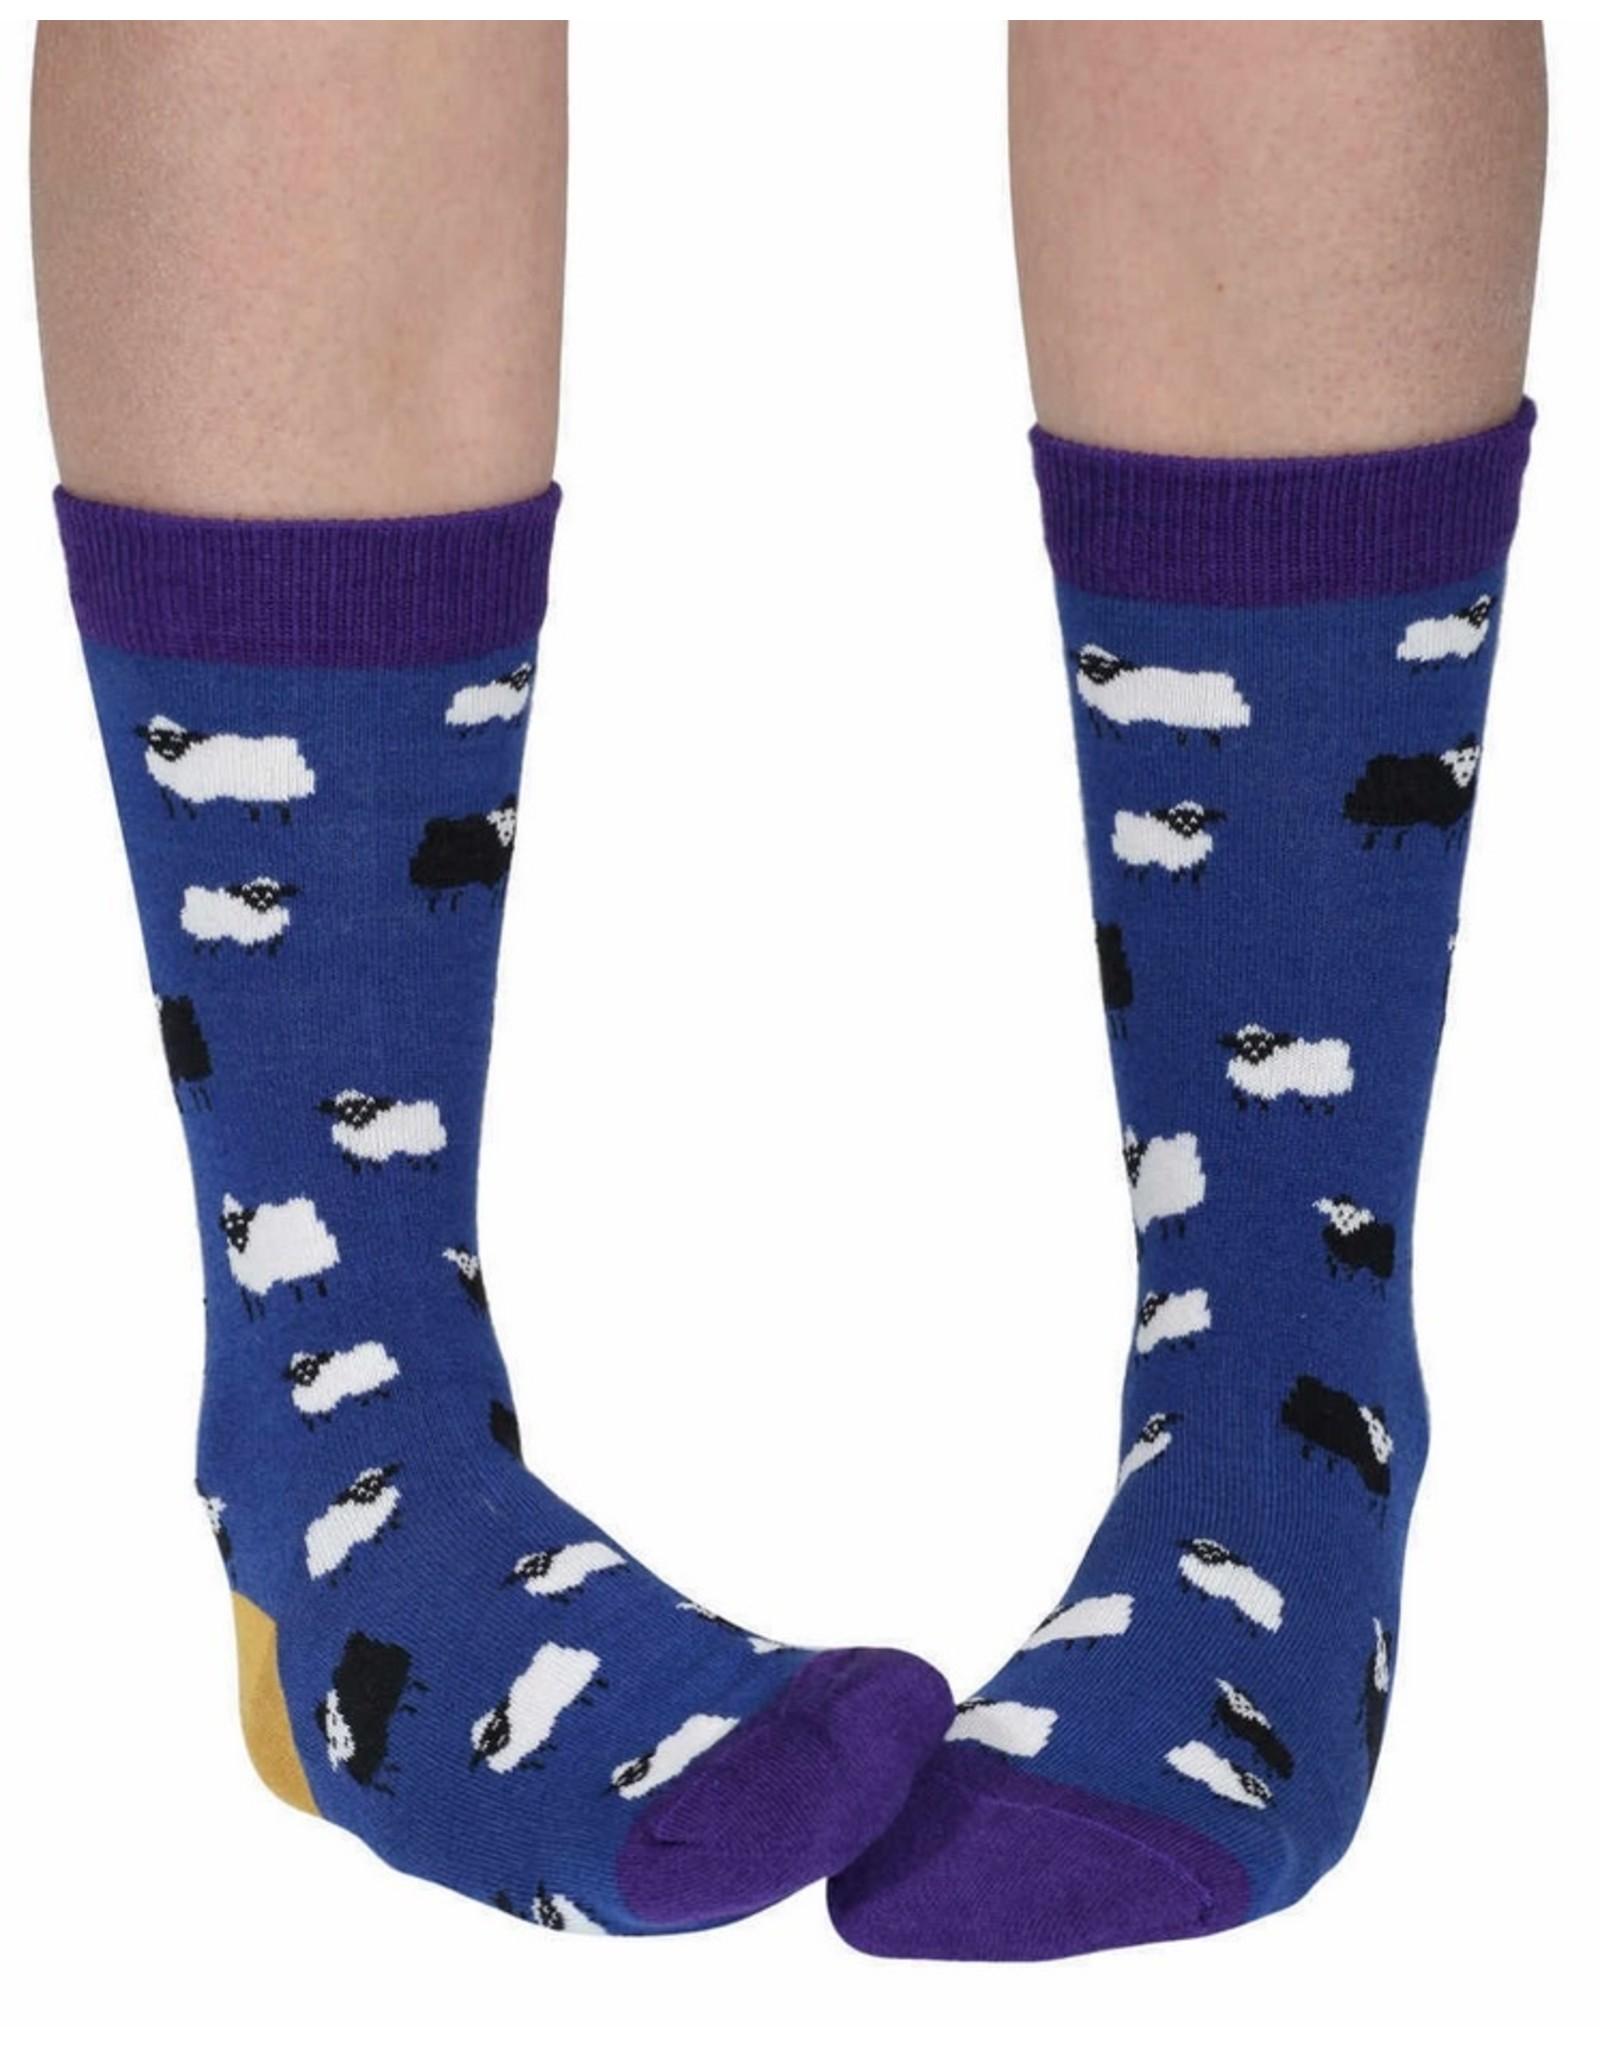 Doris & Dude Socks - darkblue sheep (36-40)